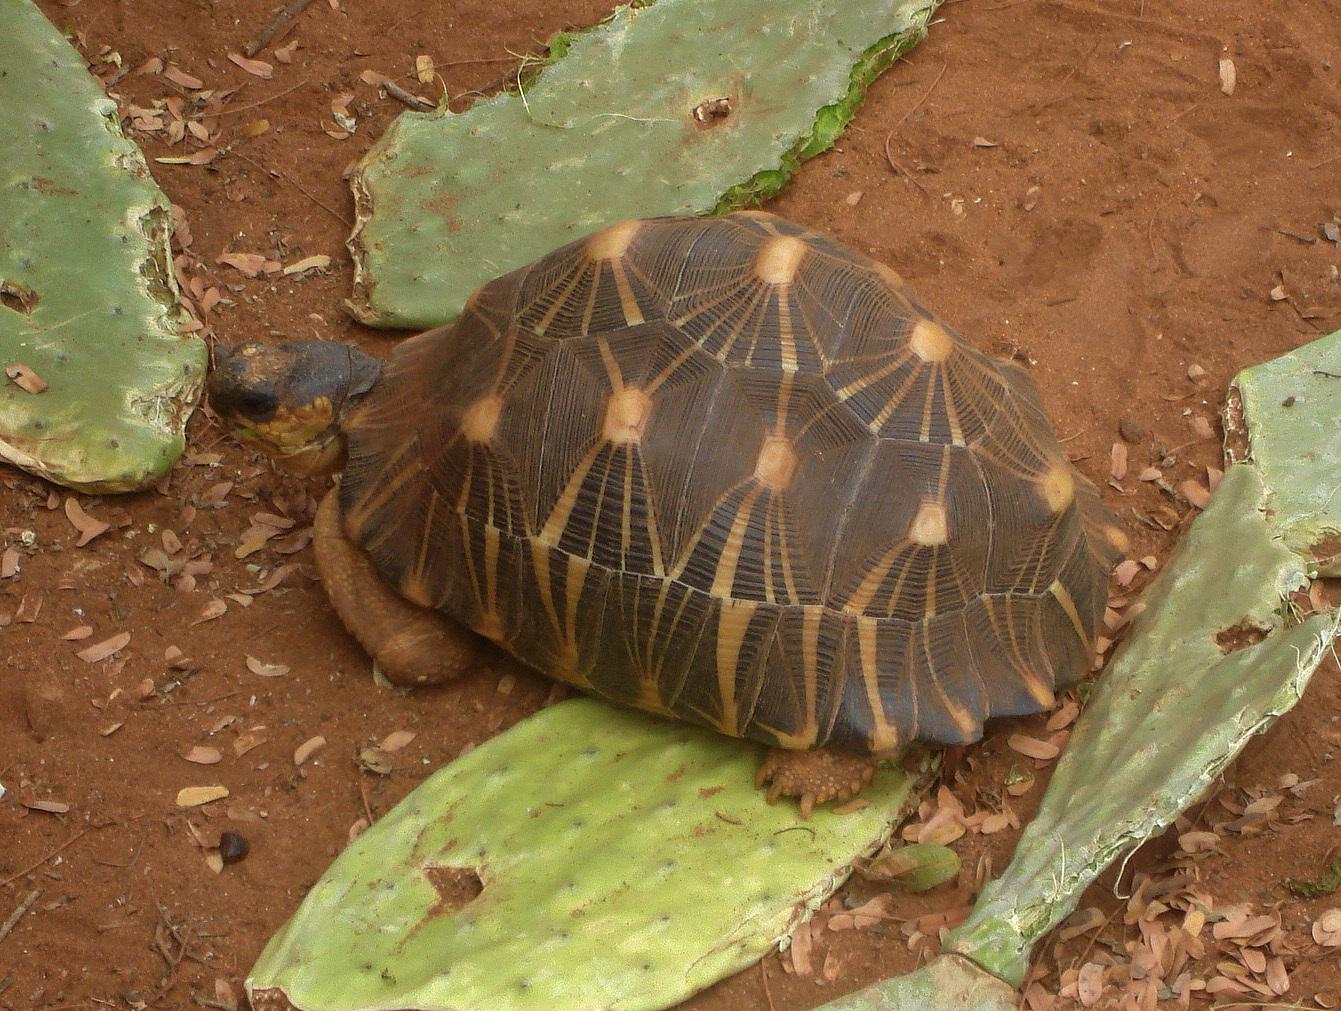 Image of Radiated tortoise